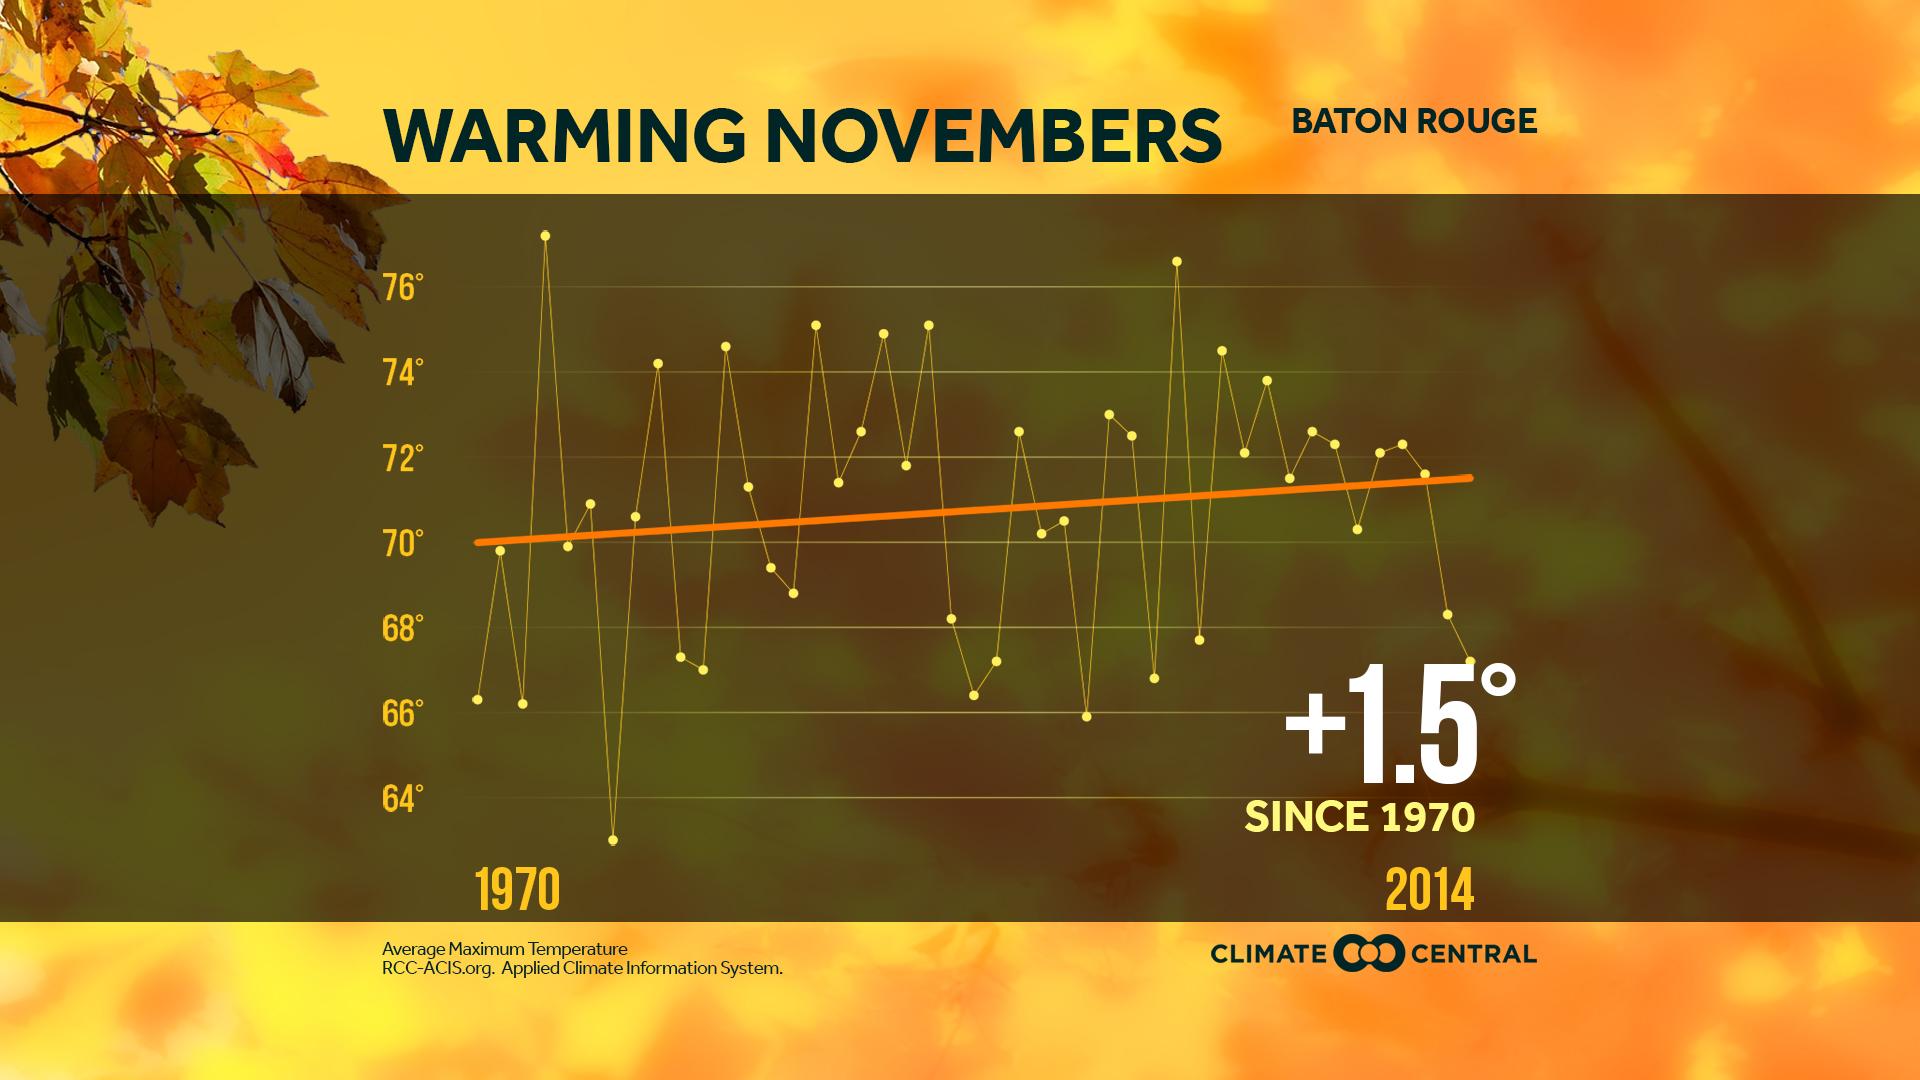 November temperatures in baton rouge